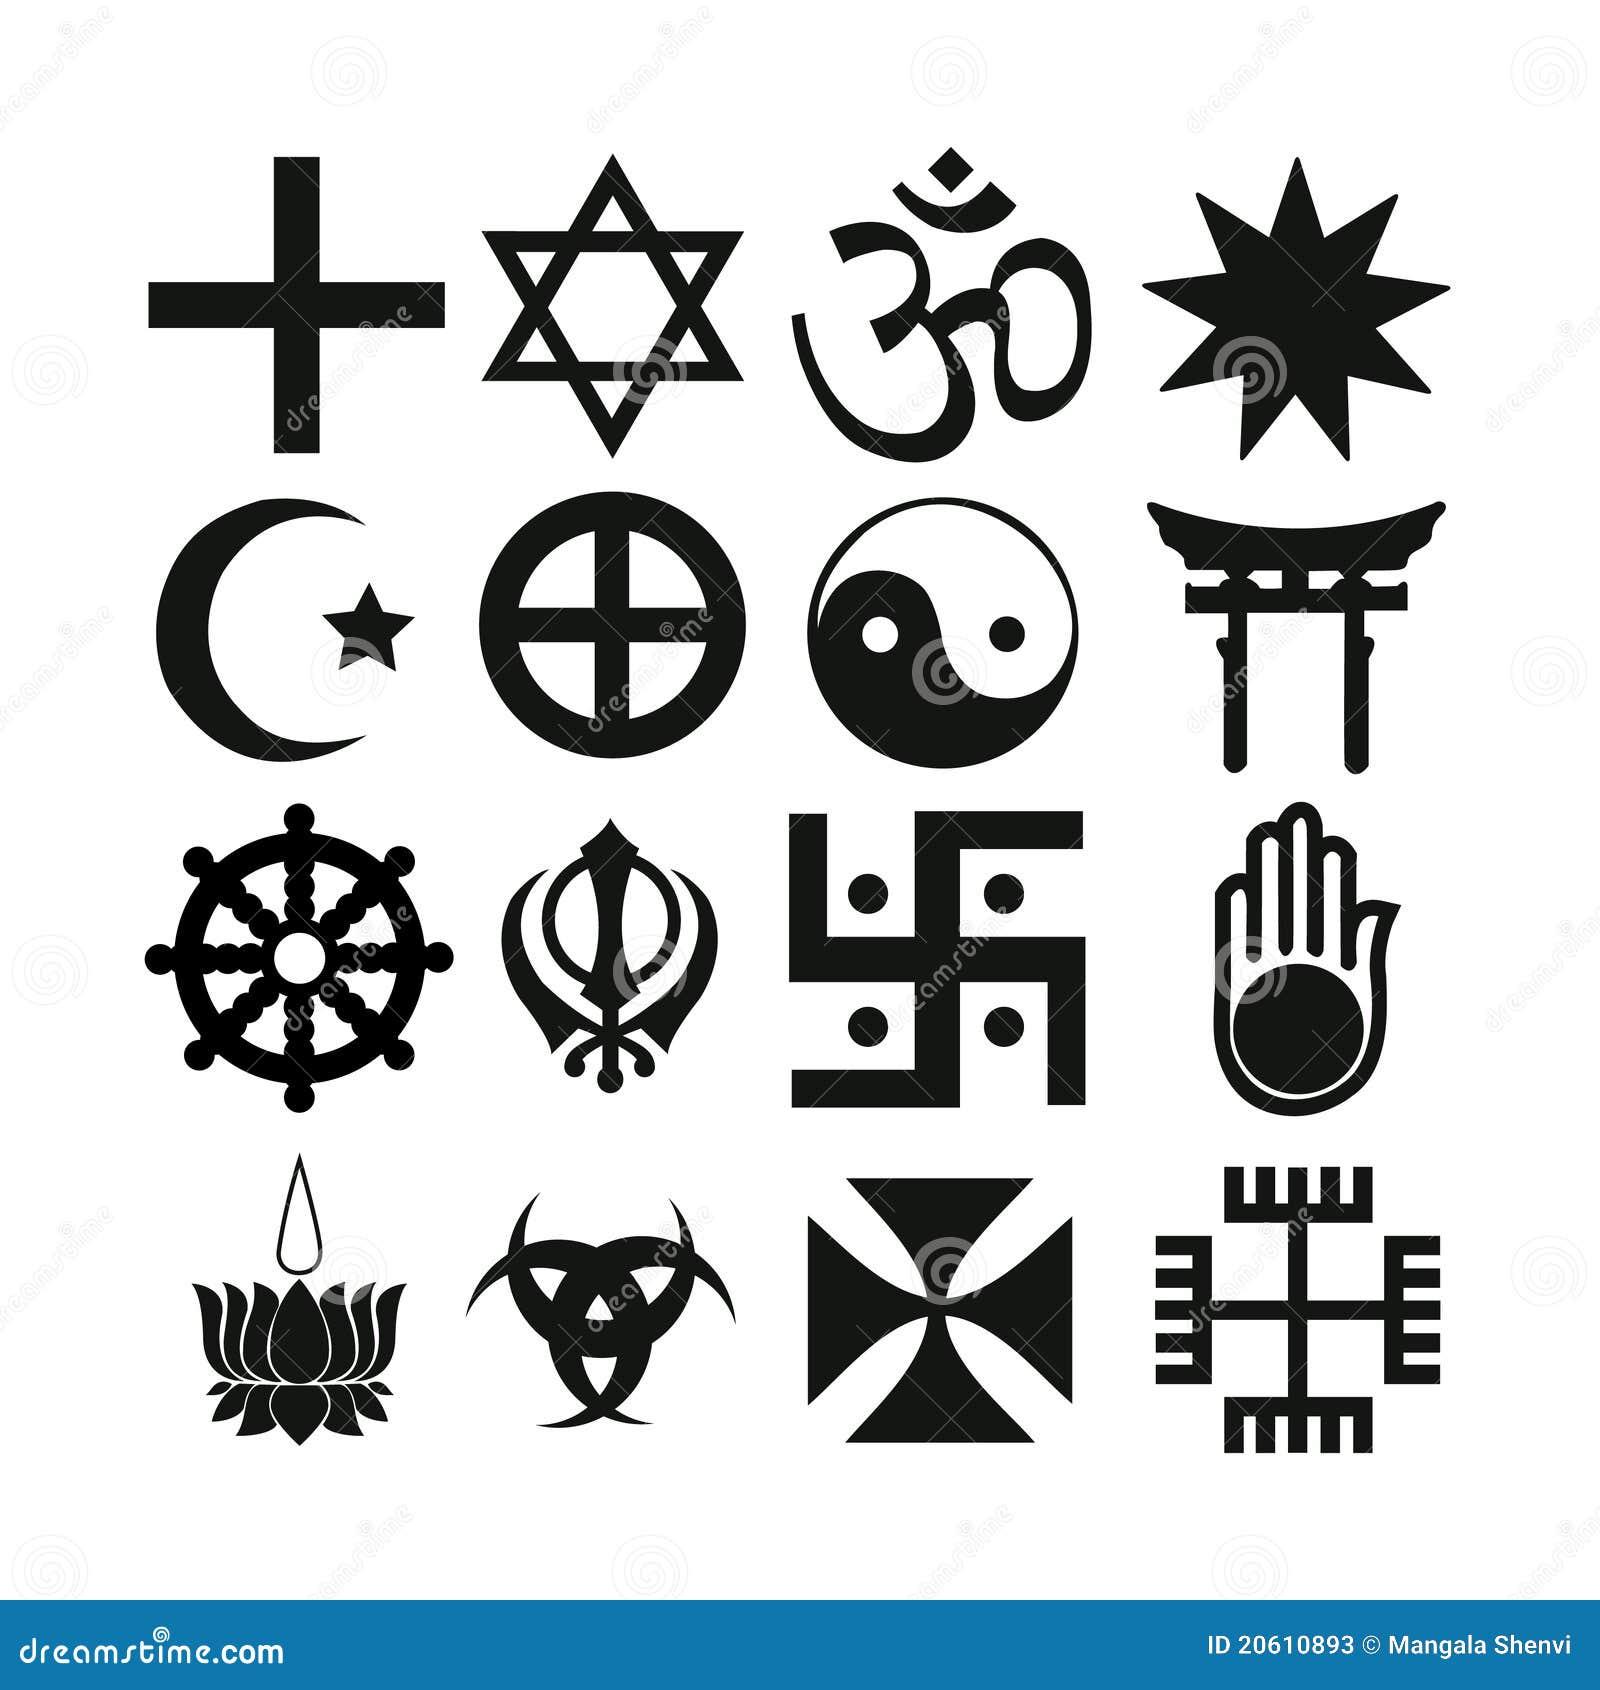 Symbols stock illustrations 216884 symbols stock illustrations religious symbols isolated on white stock photos biocorpaavc Image collections